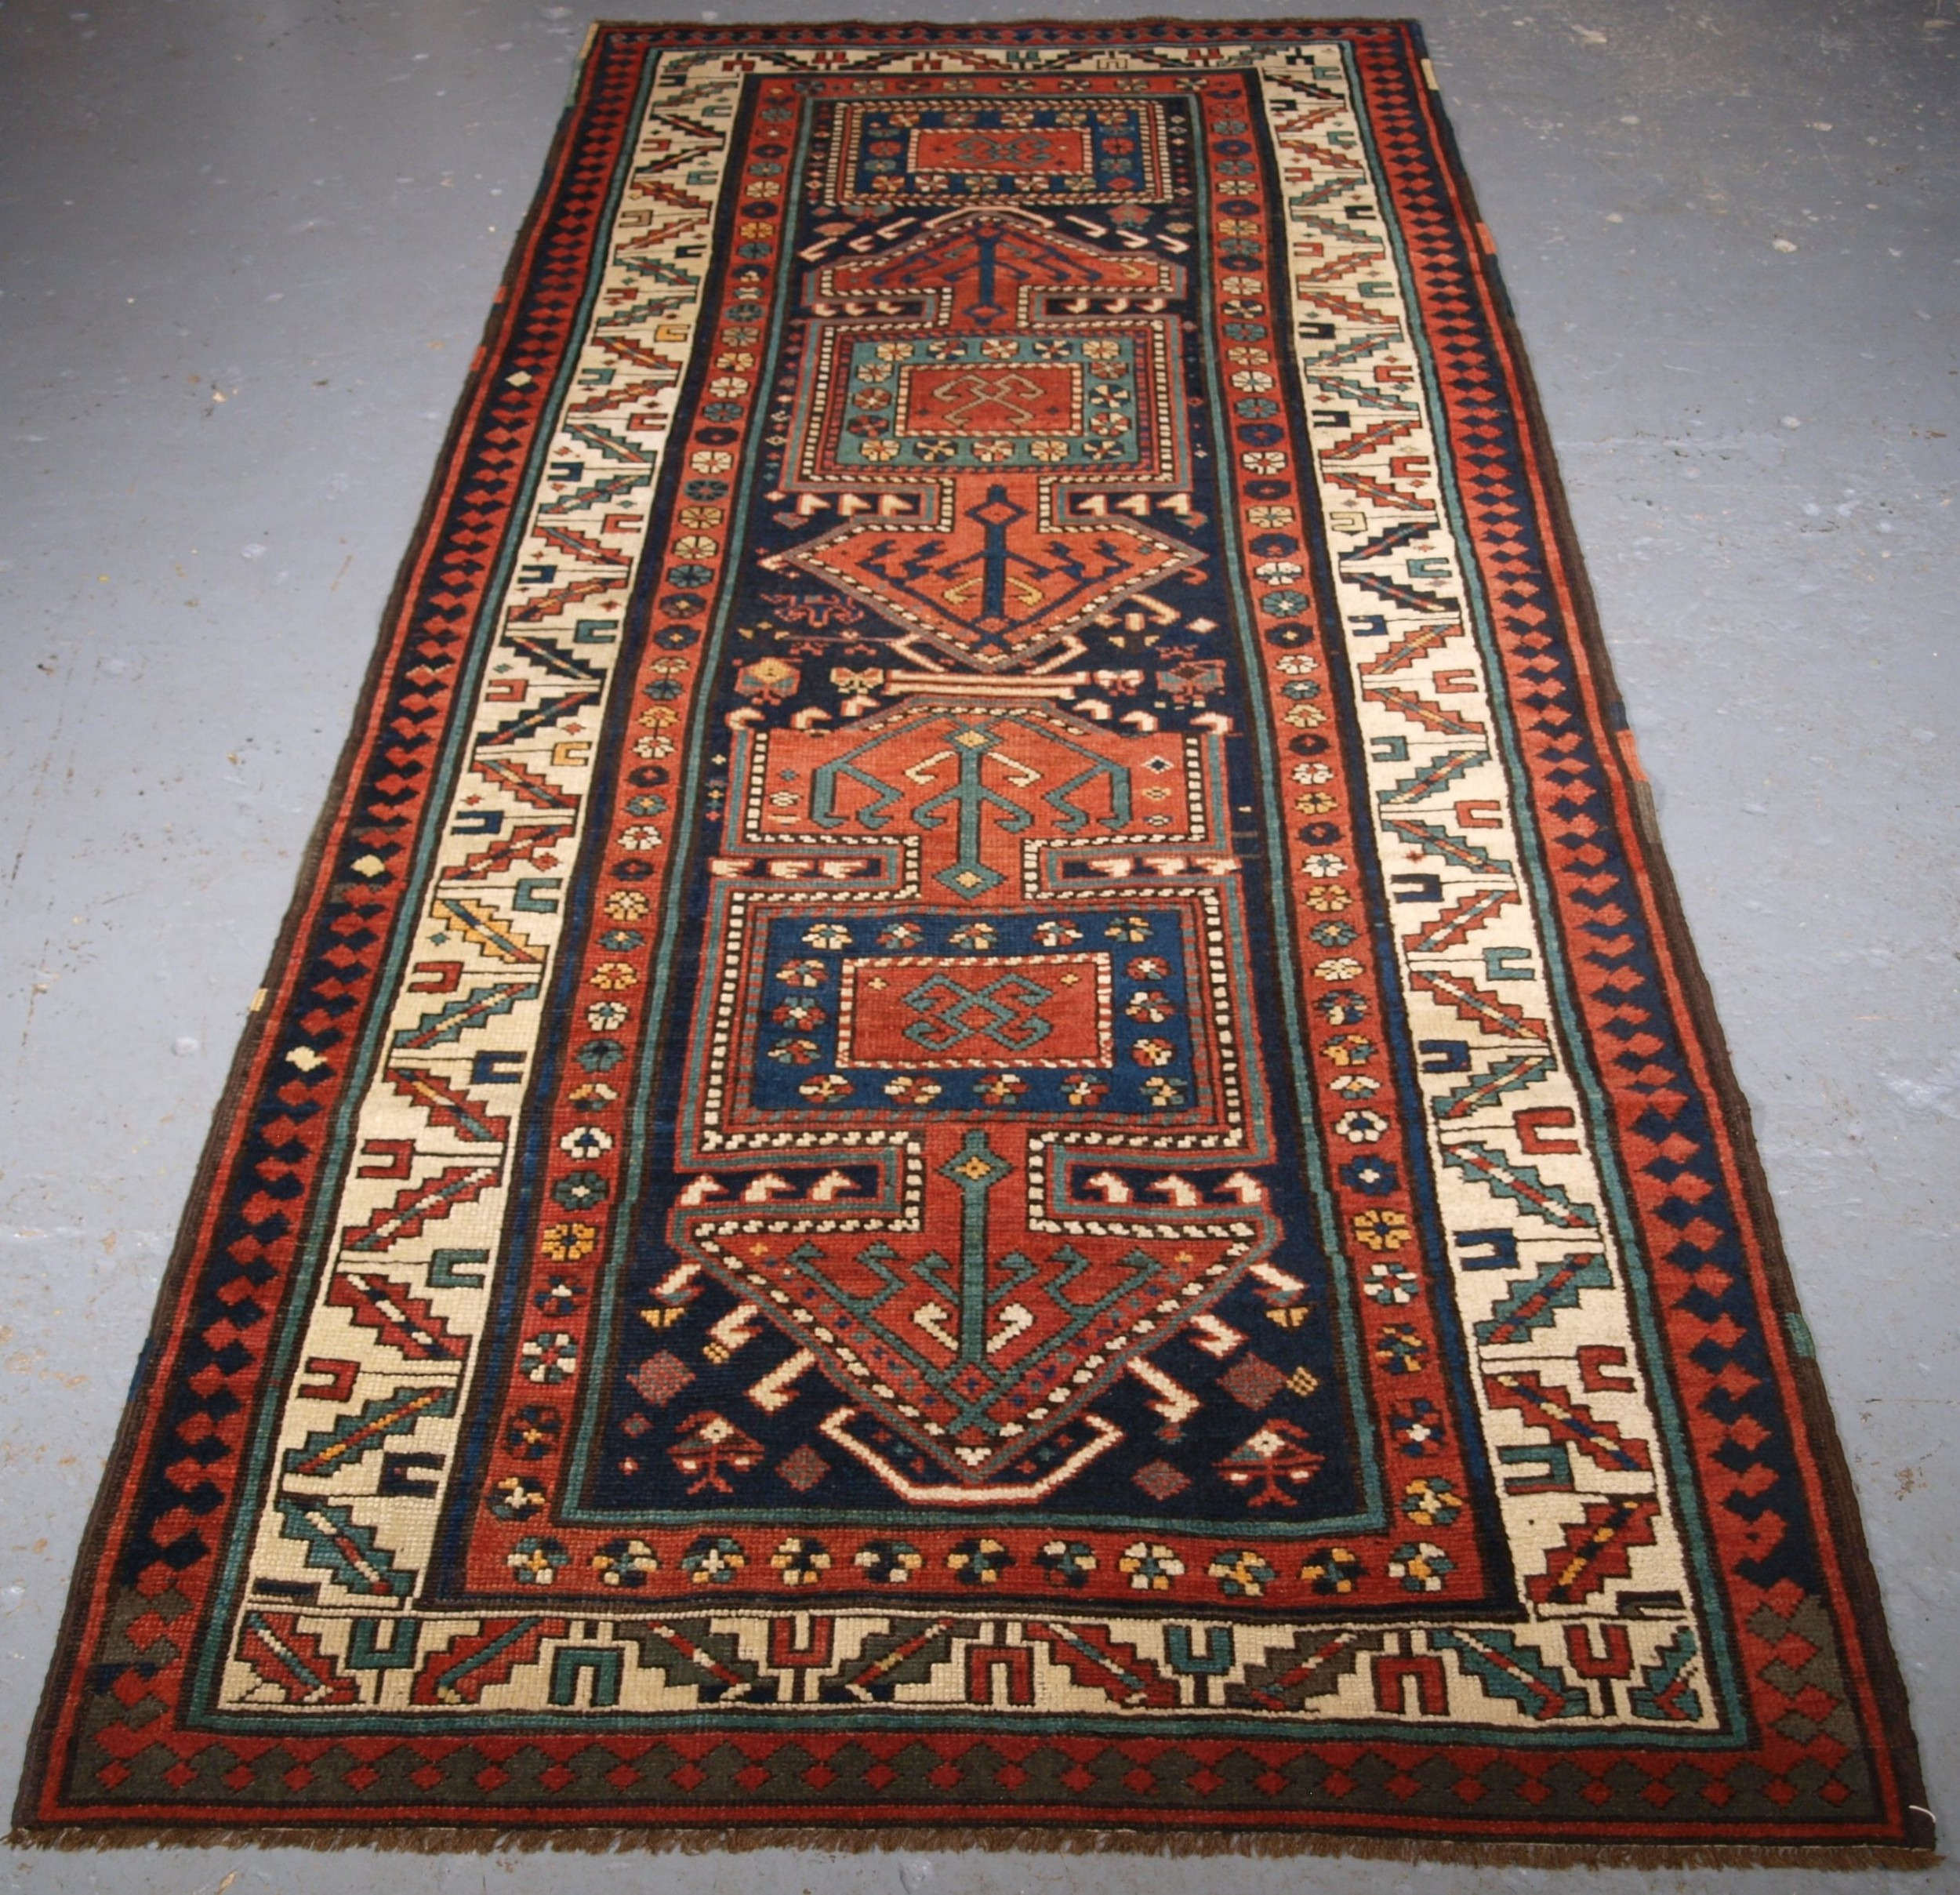 antique kelardasht runner or long rug scarce traditional design circa 1890